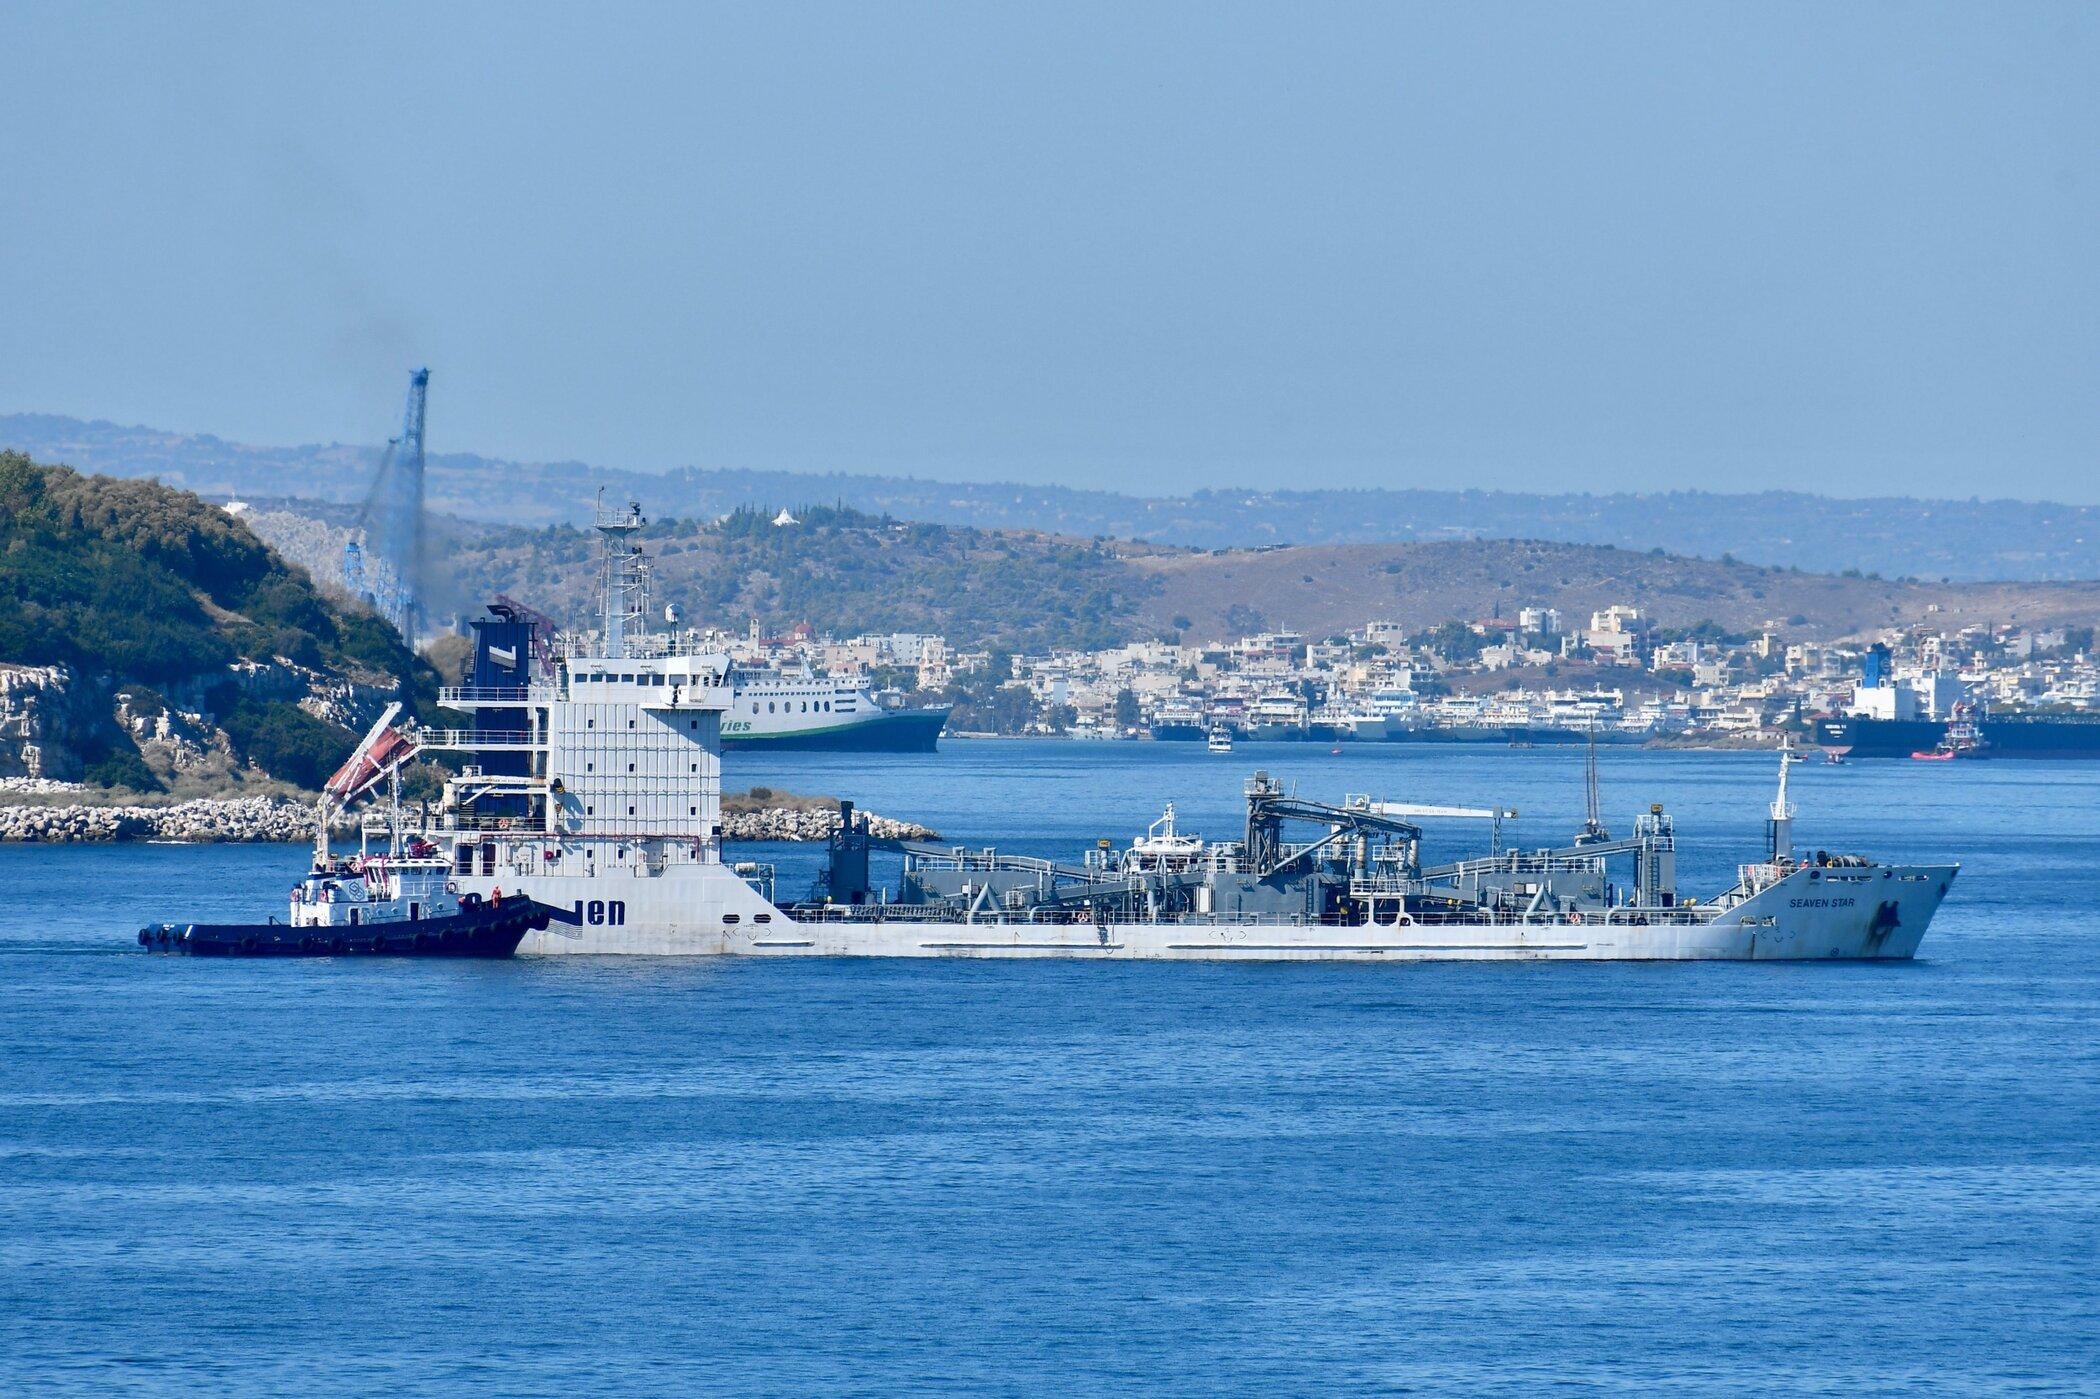 Seaven Star_15-10-20_Piraeus